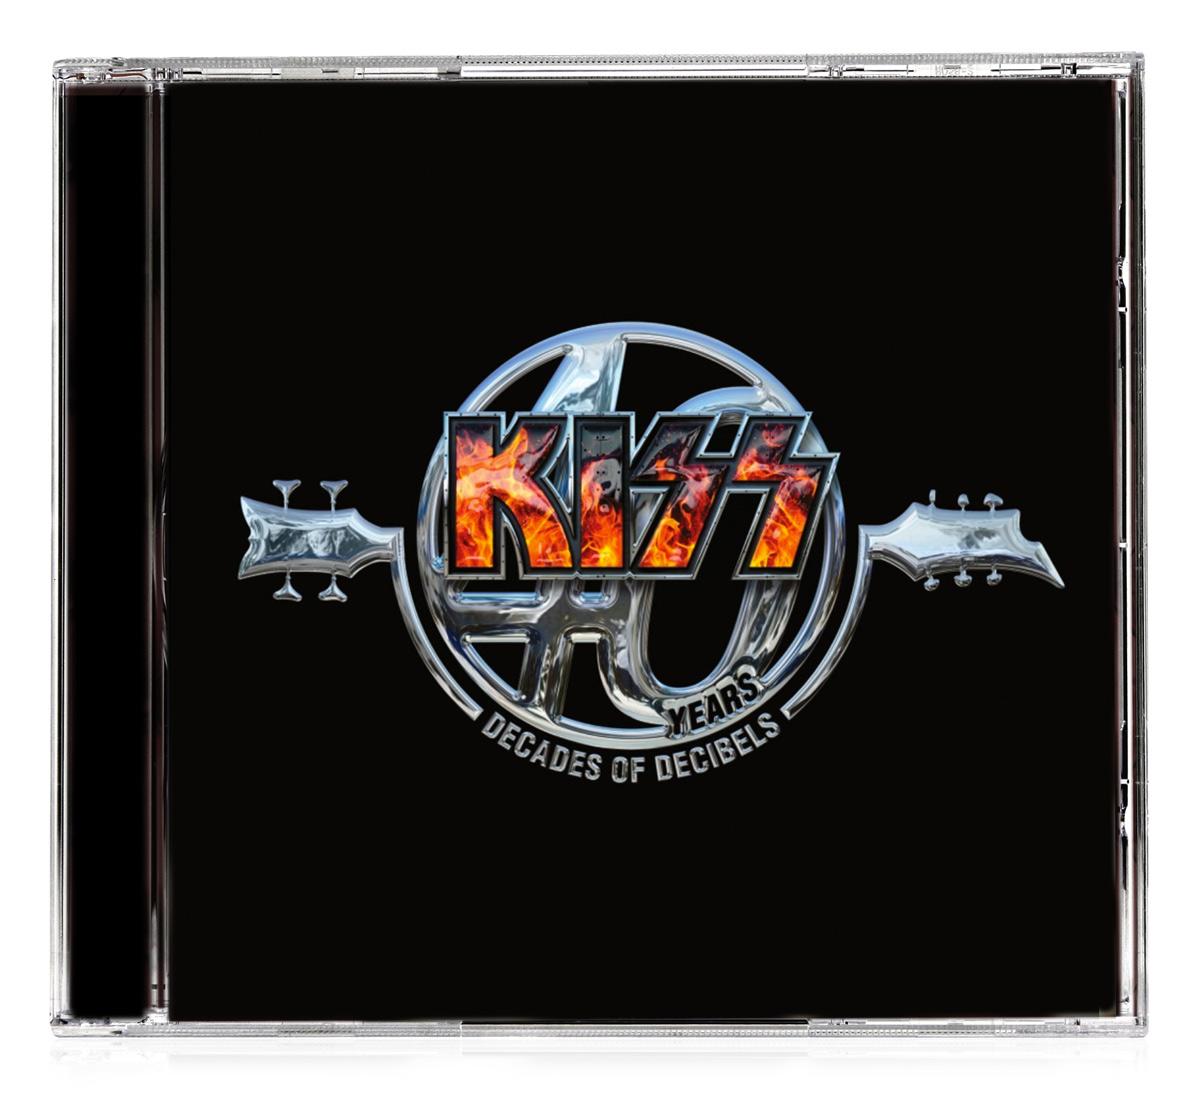 CD Duplo Kiss 40 Years